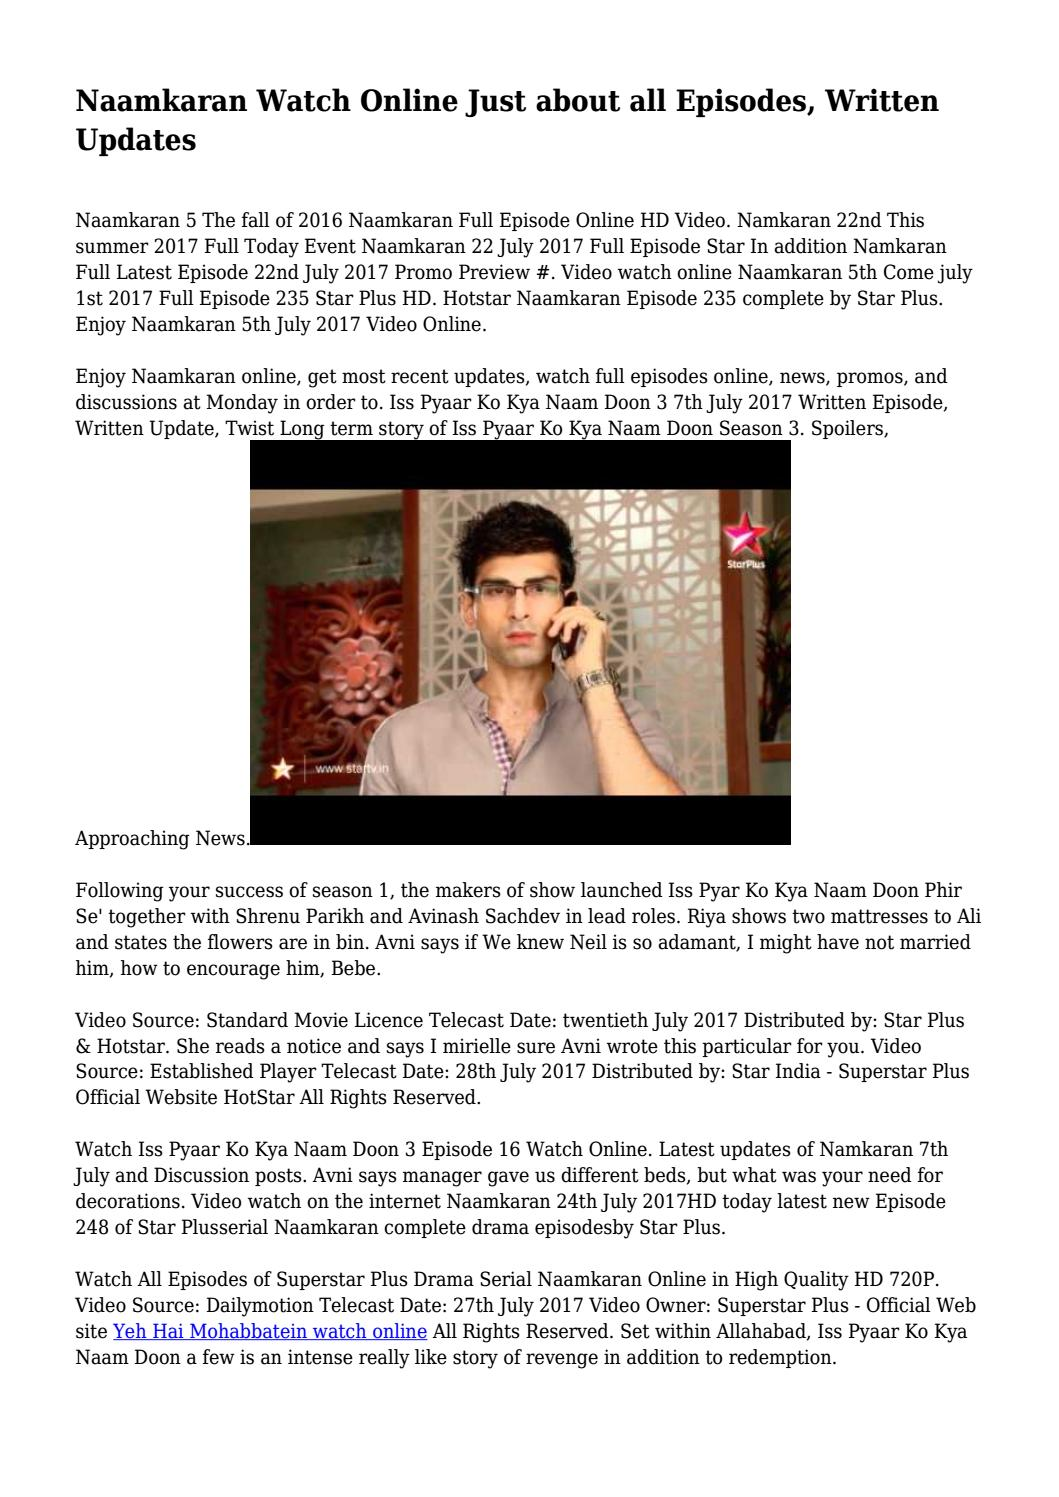 Naamkaran Watch Online Just about all Episodes, Written Updates